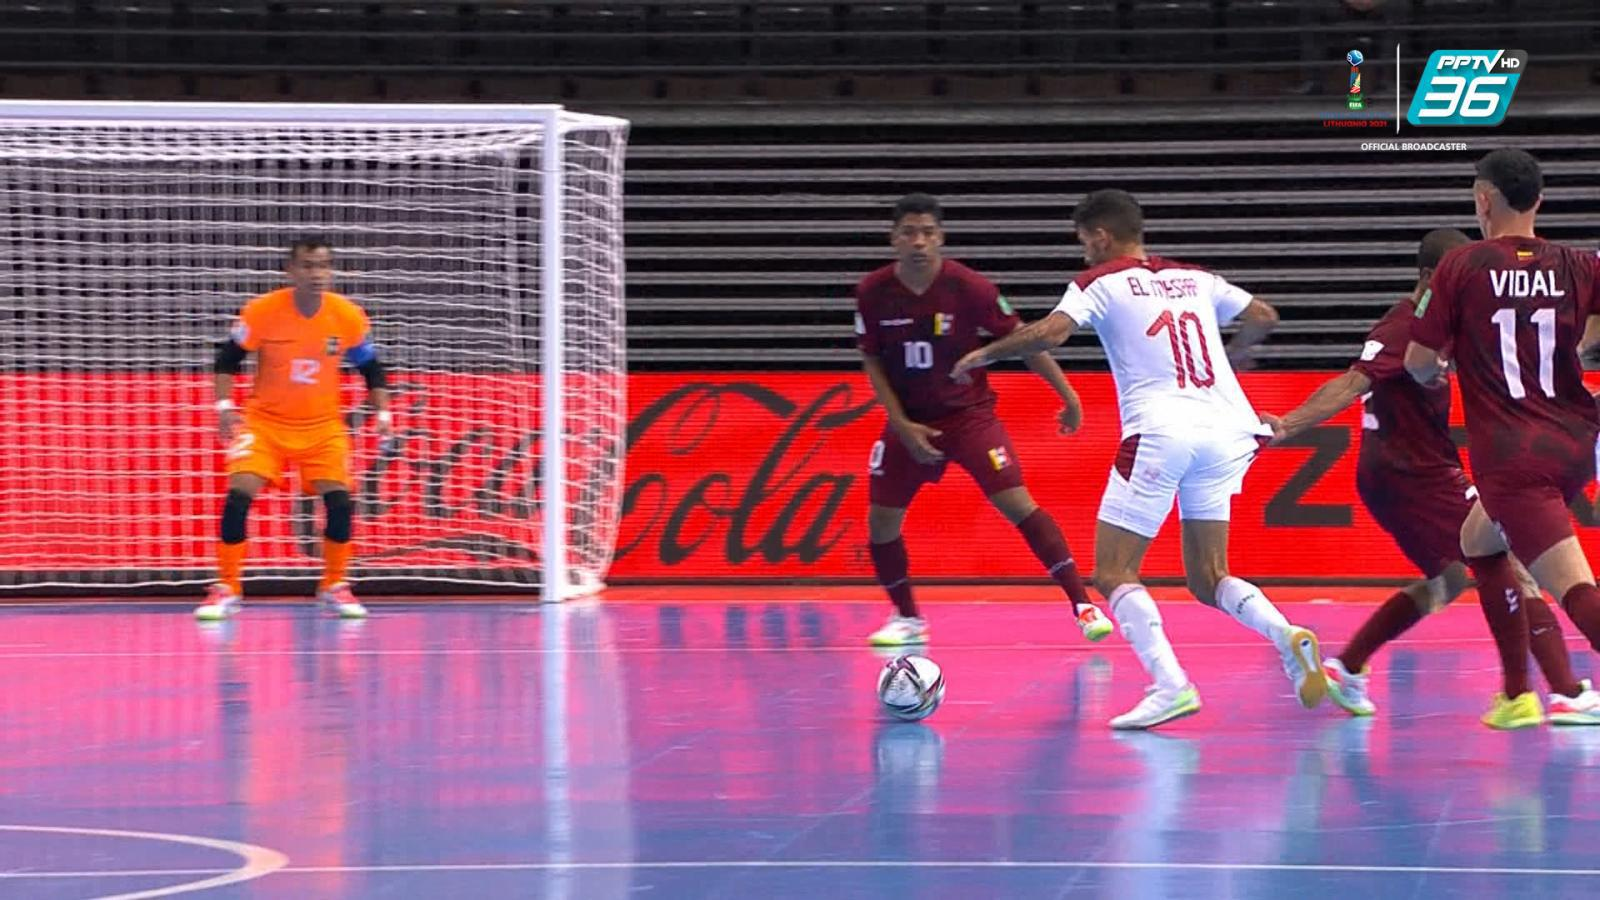 Full Match | ฟีฟ่า ฟุตซอล เวิลด์ คัพ 2021 | เวเนซุเอลา พบ โมร็อคโก | 22 ก.ย. 64